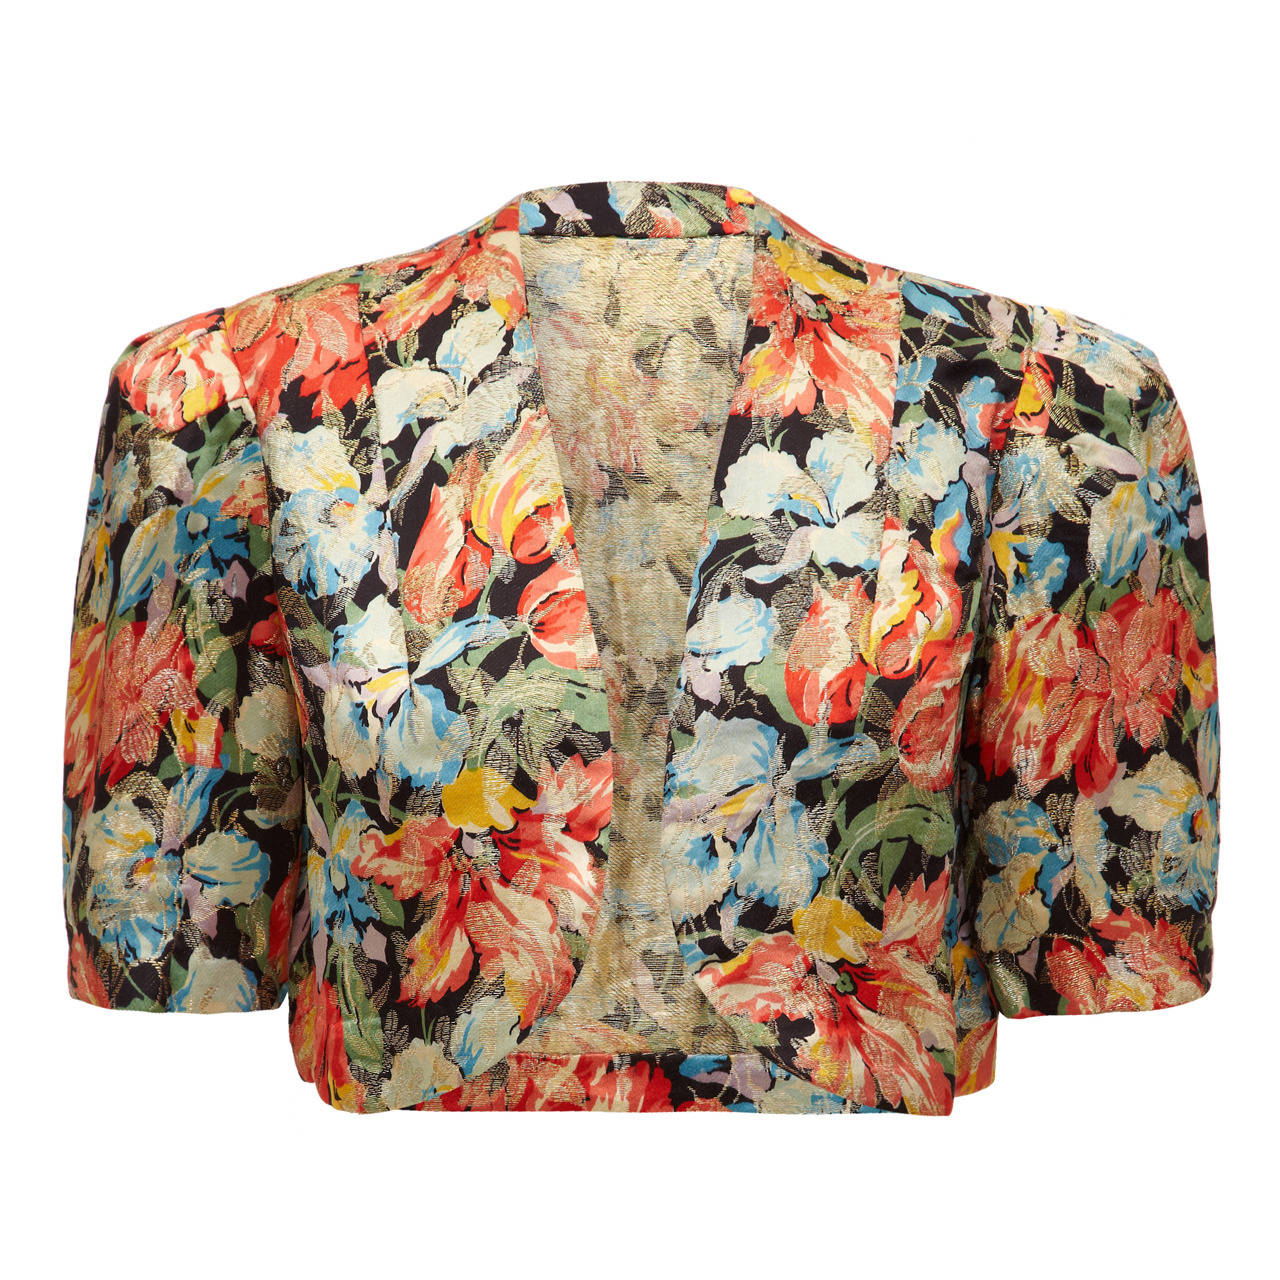 1930s Floral Lame Jacket 1